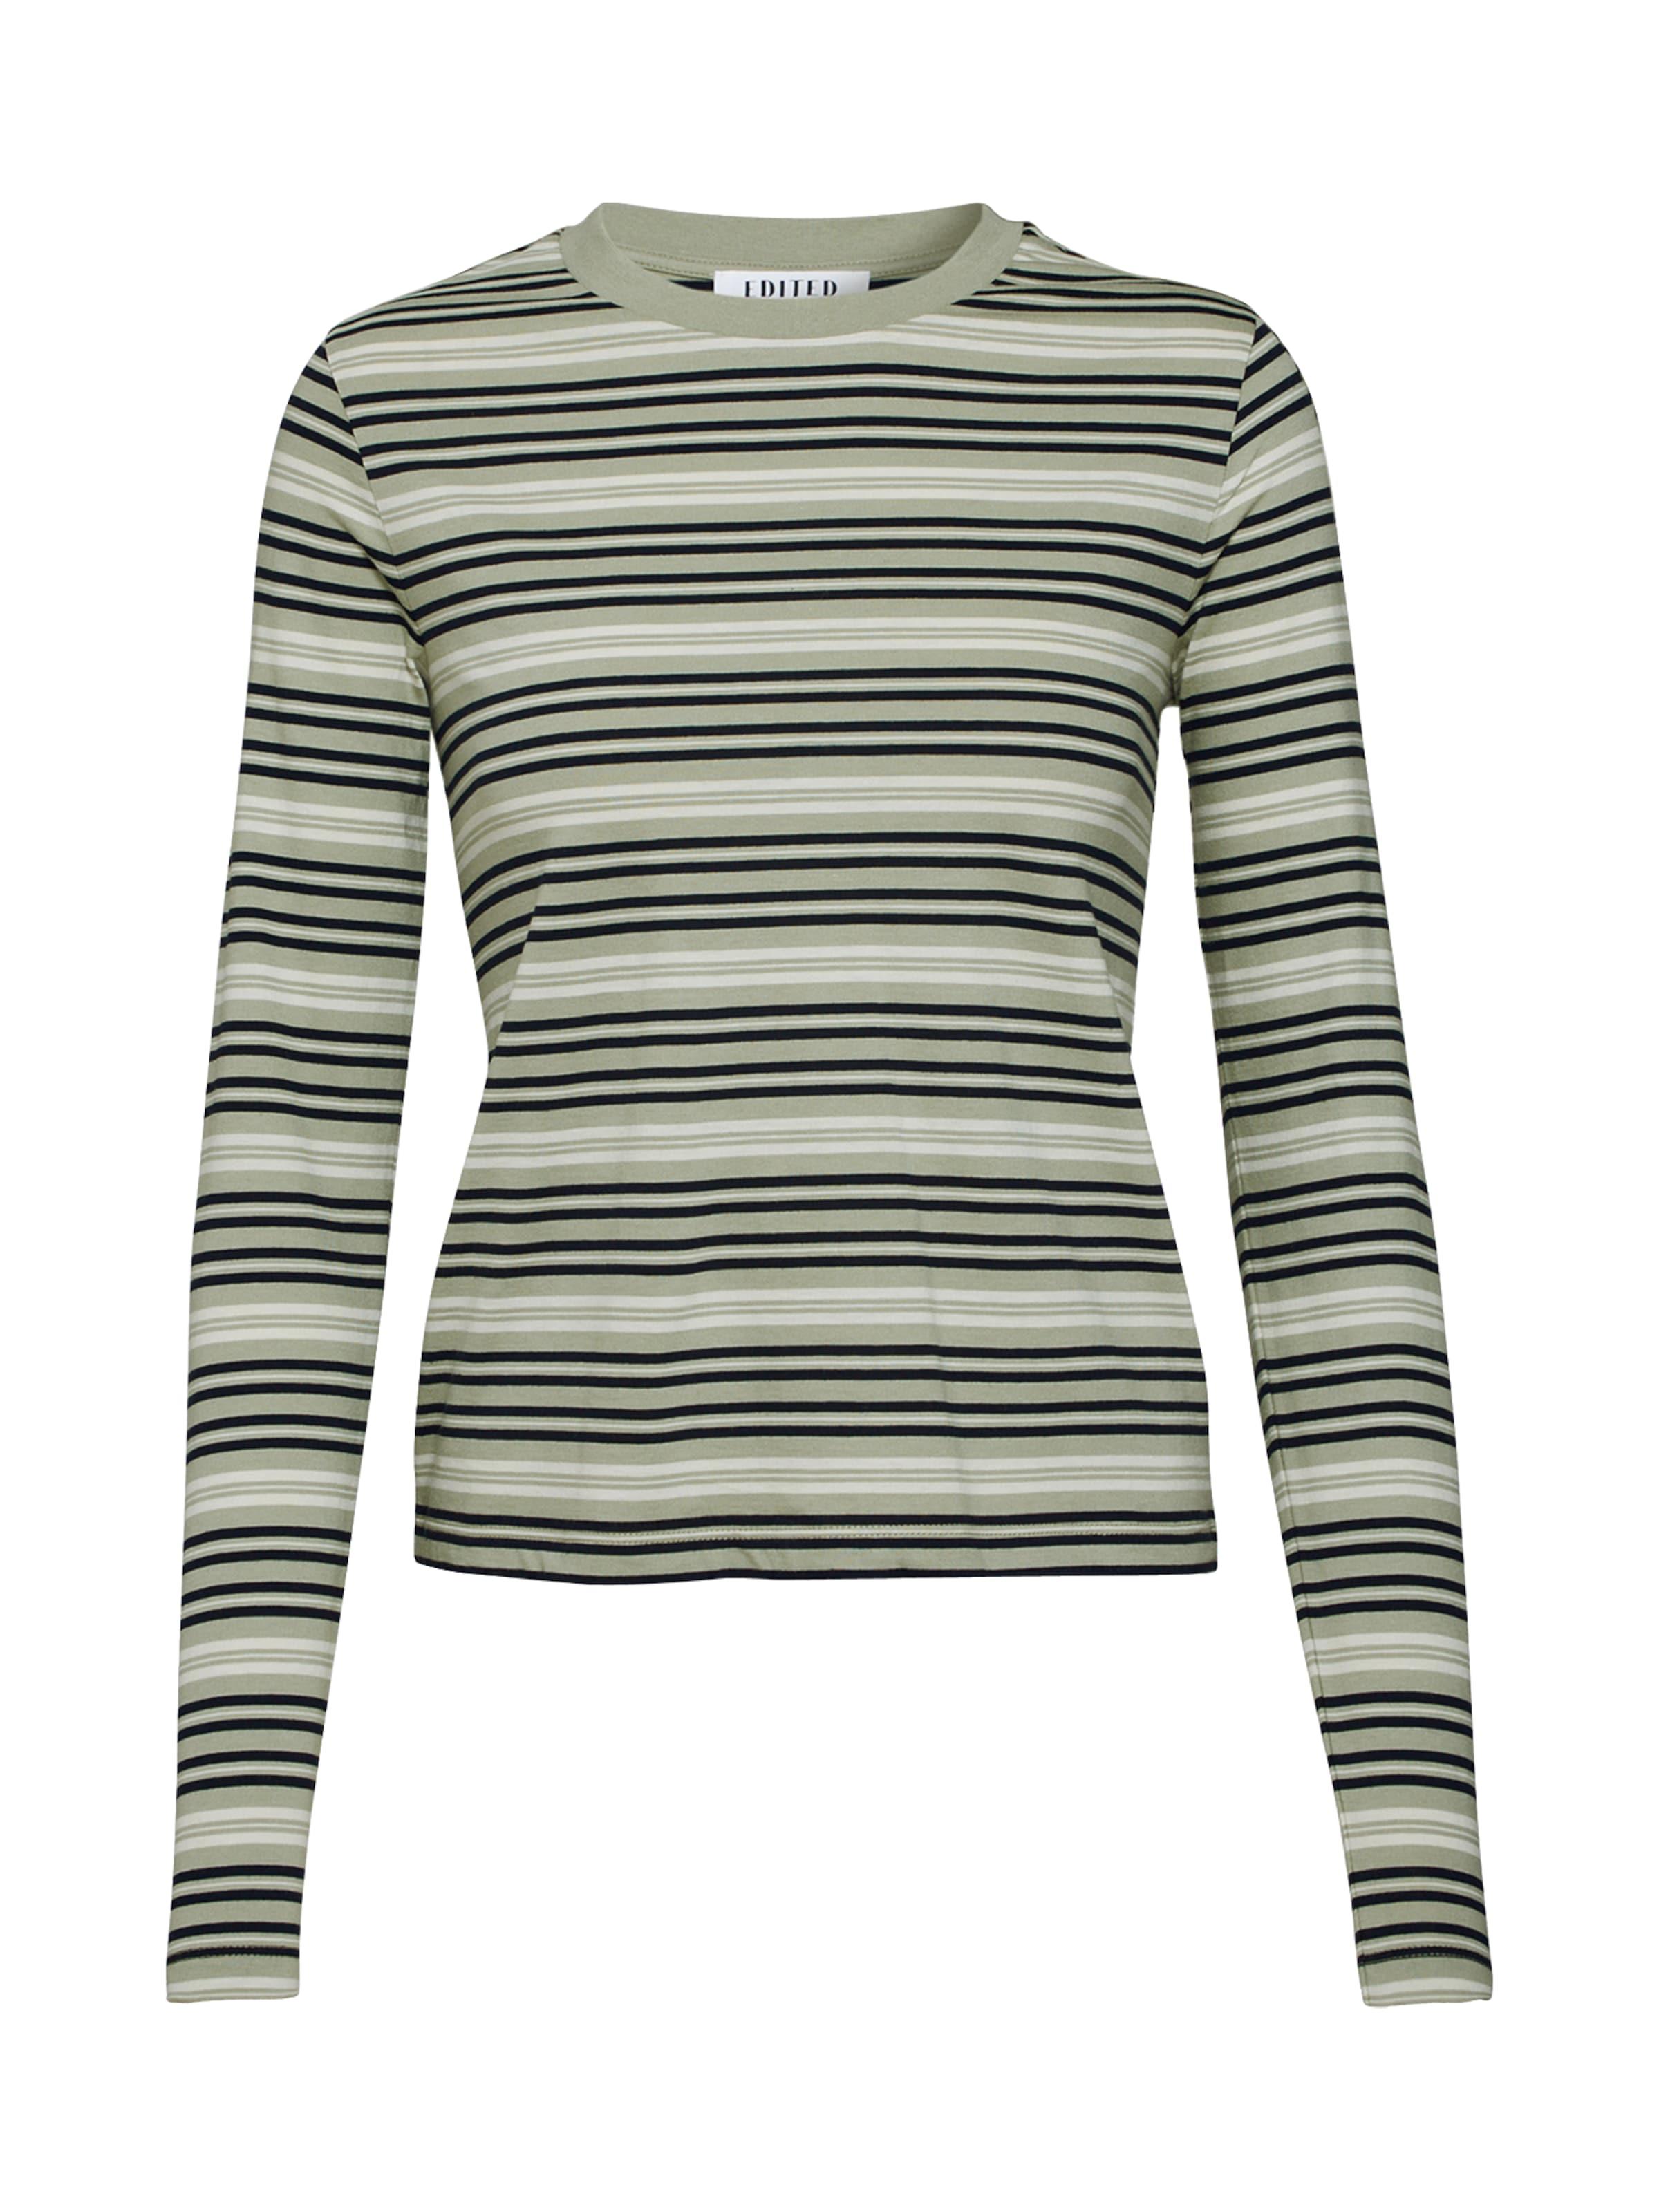 En BleuVert Blanc Edited T shirt 'pixie' FK1J3lTc